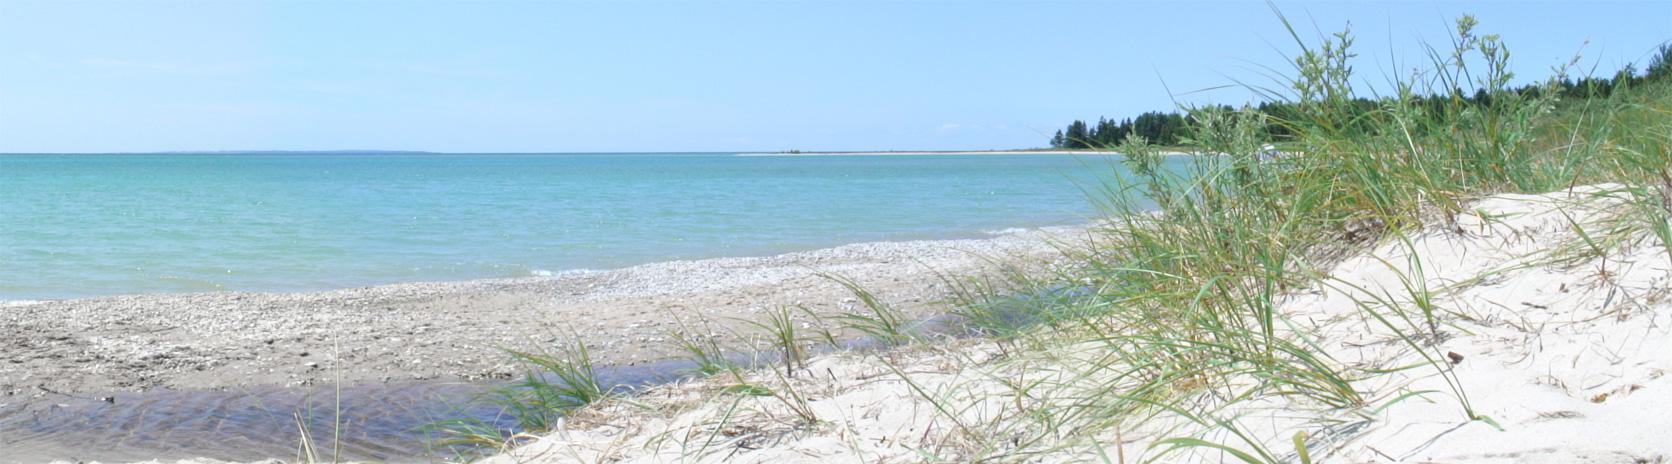 Iron Ore Bay on Beaver Island.